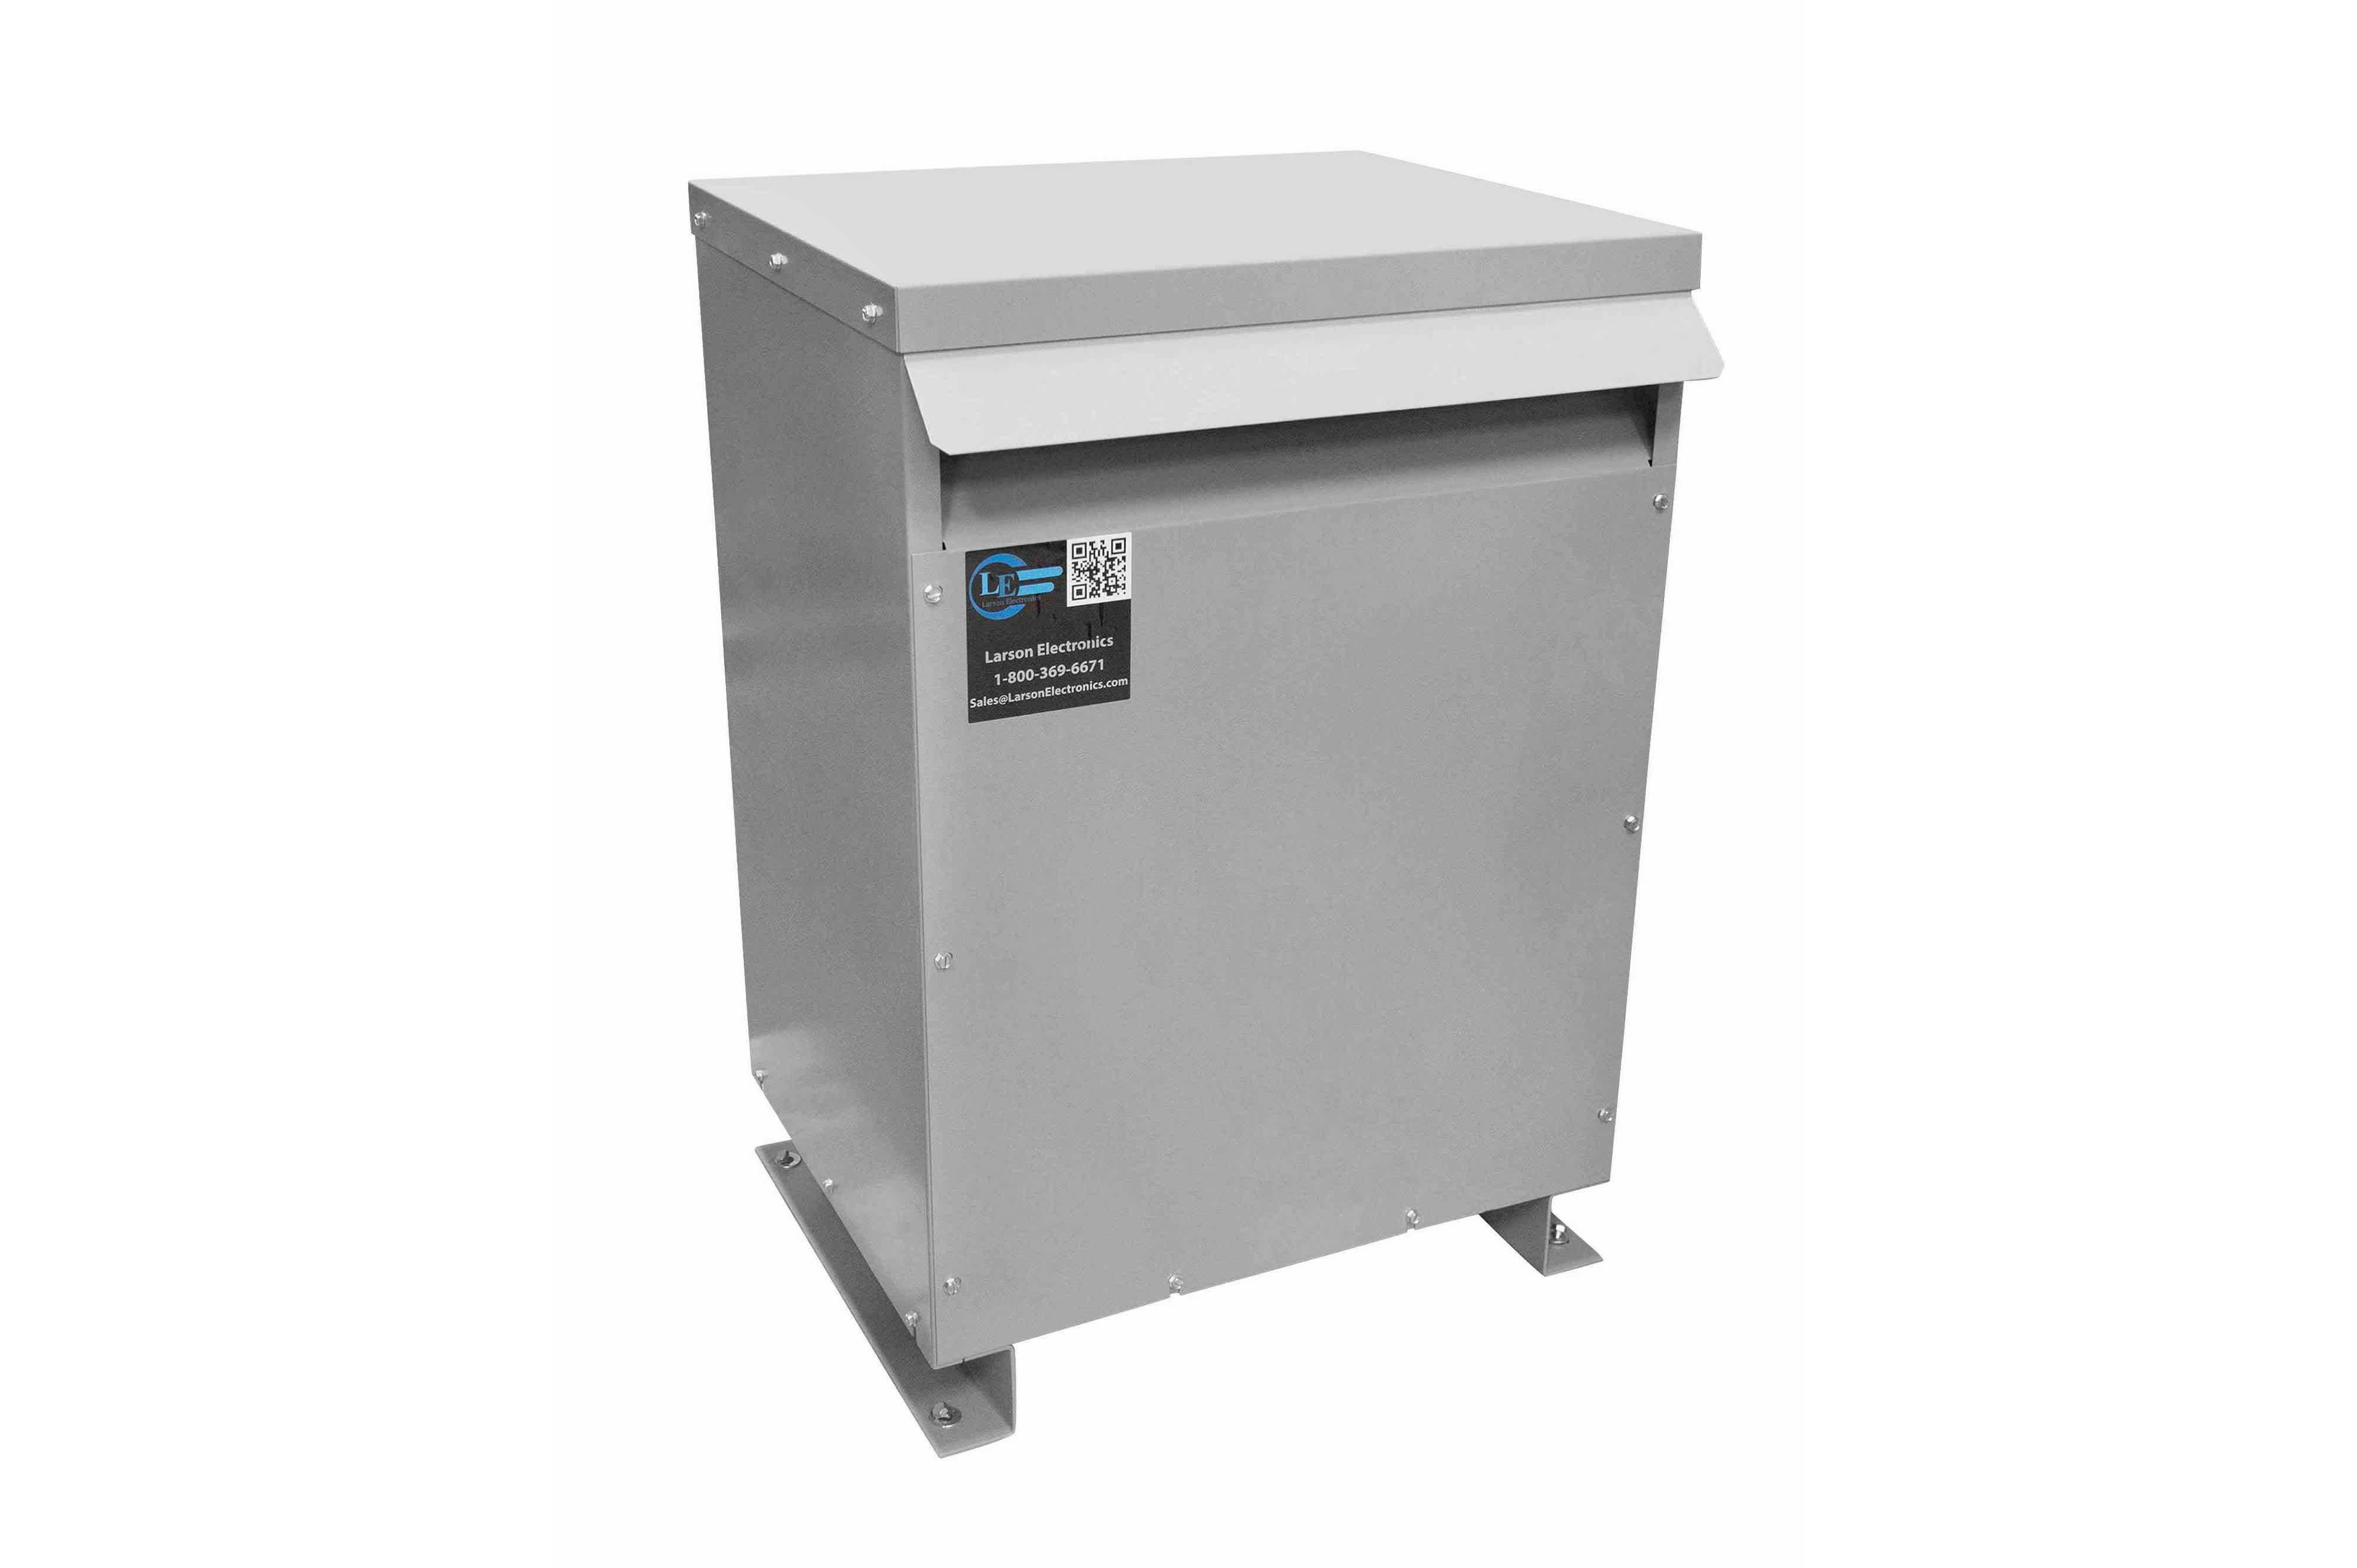 36 kVA 3PH Isolation Transformer, 400V Wye Primary, 480V Delta Secondary, N3R, Ventilated, 60 Hz